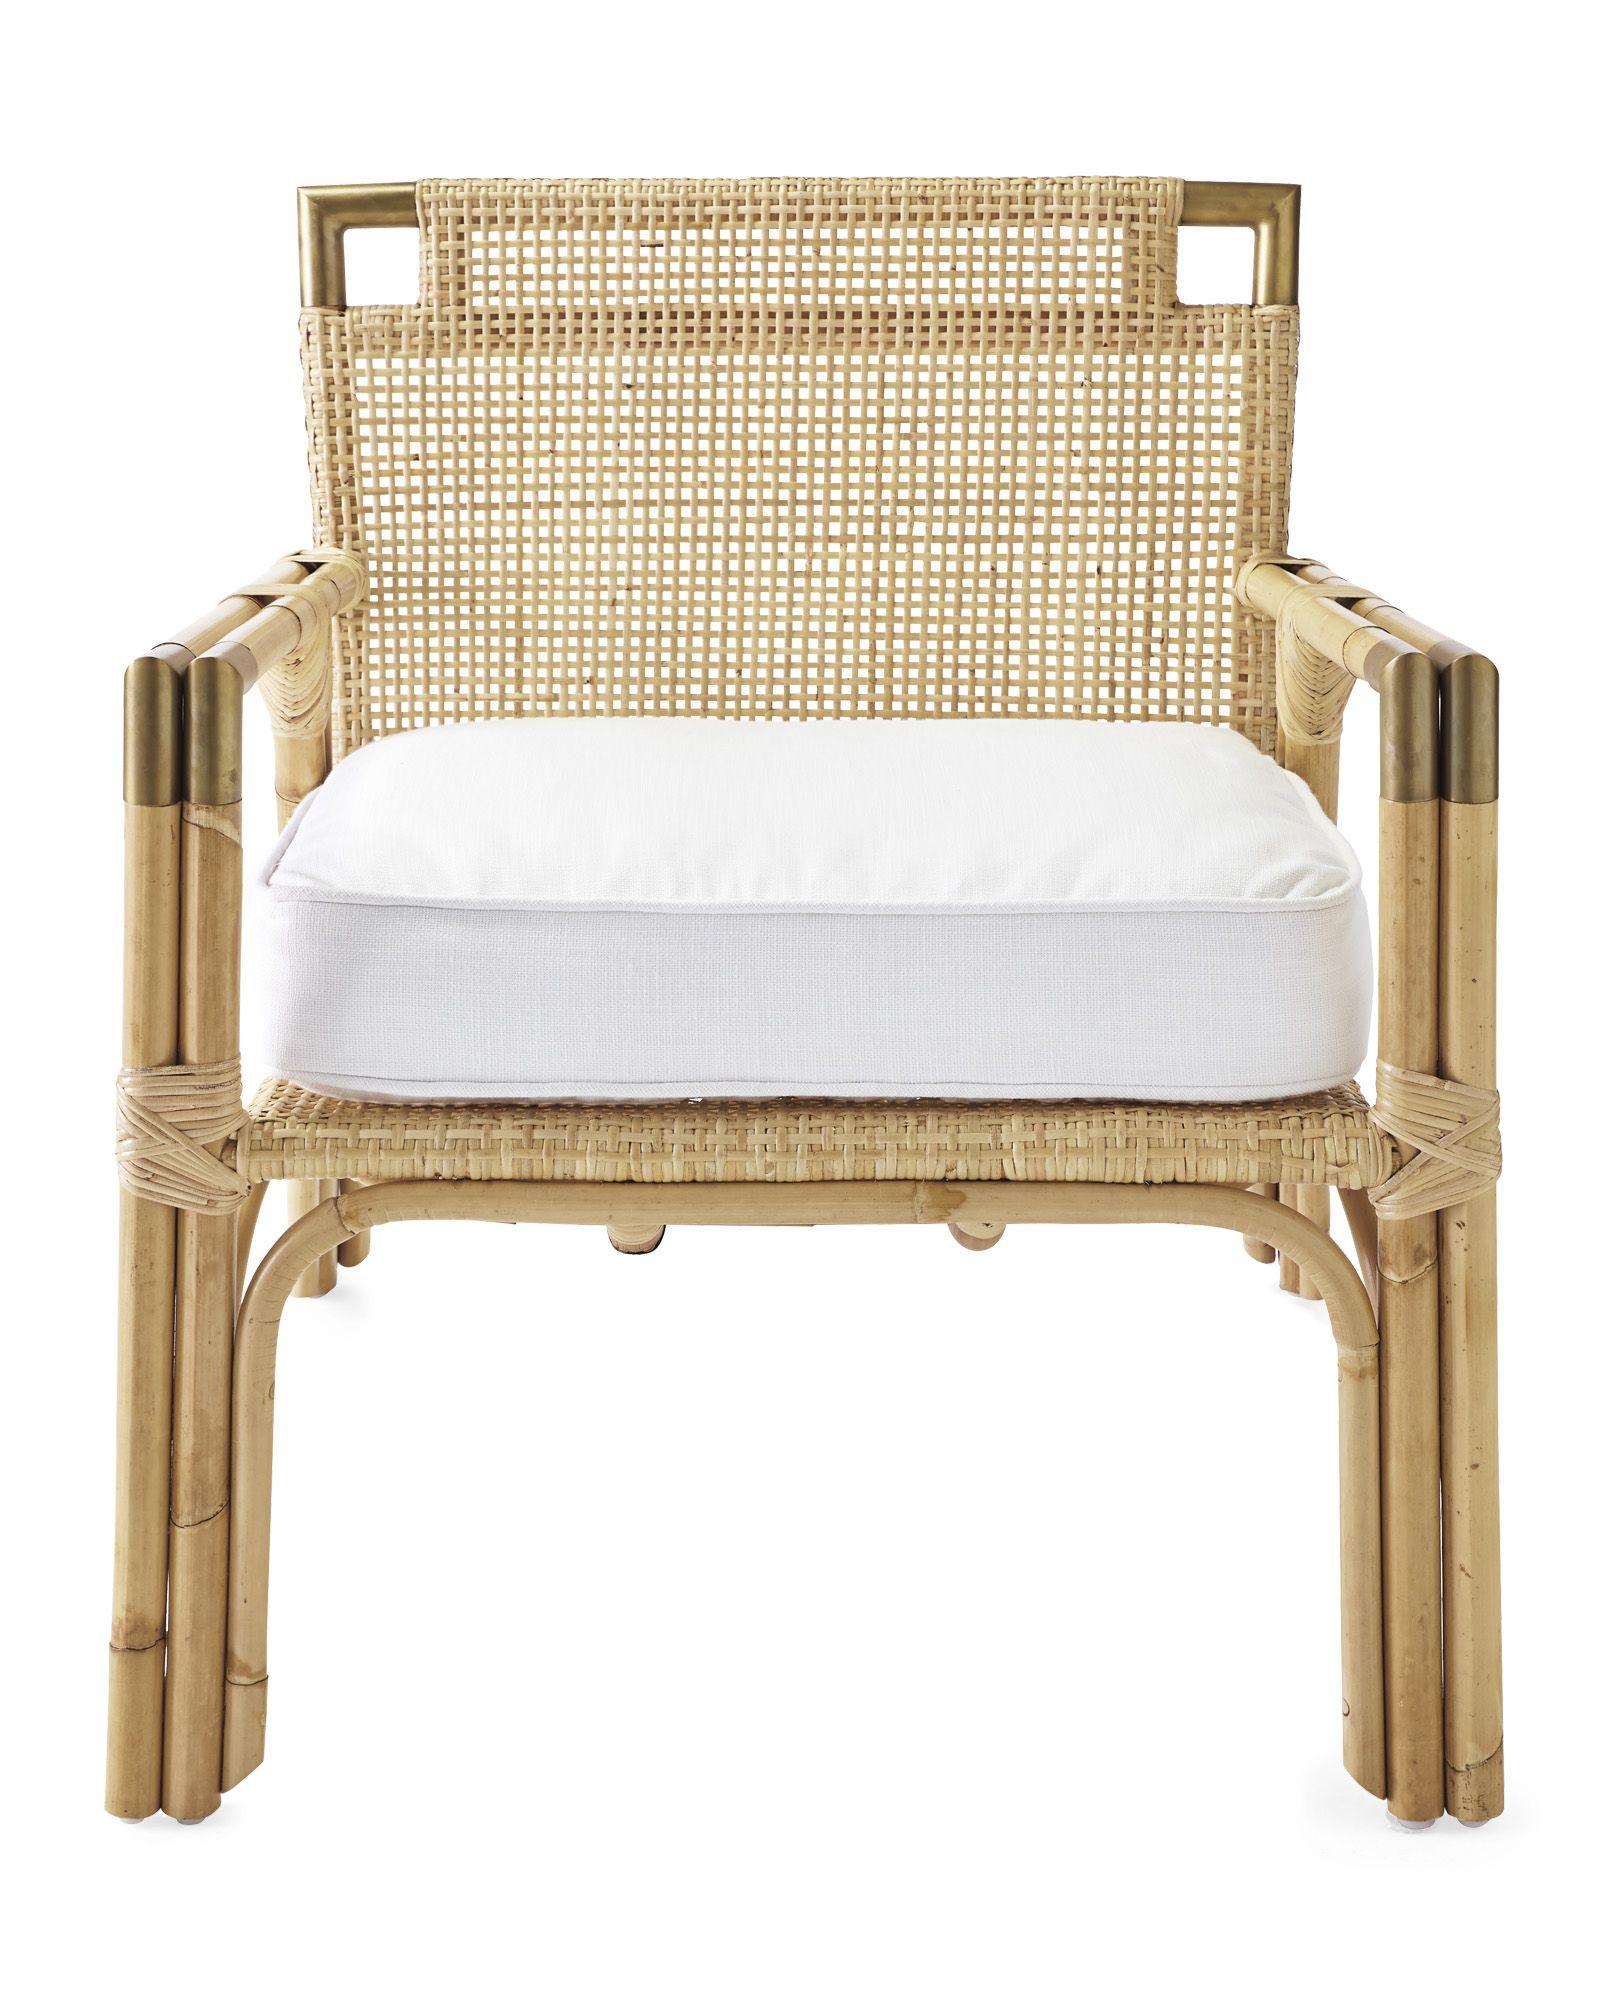 Bedroom Furniture Under 100: Swell Seasonal: Spring Home Decor Edit